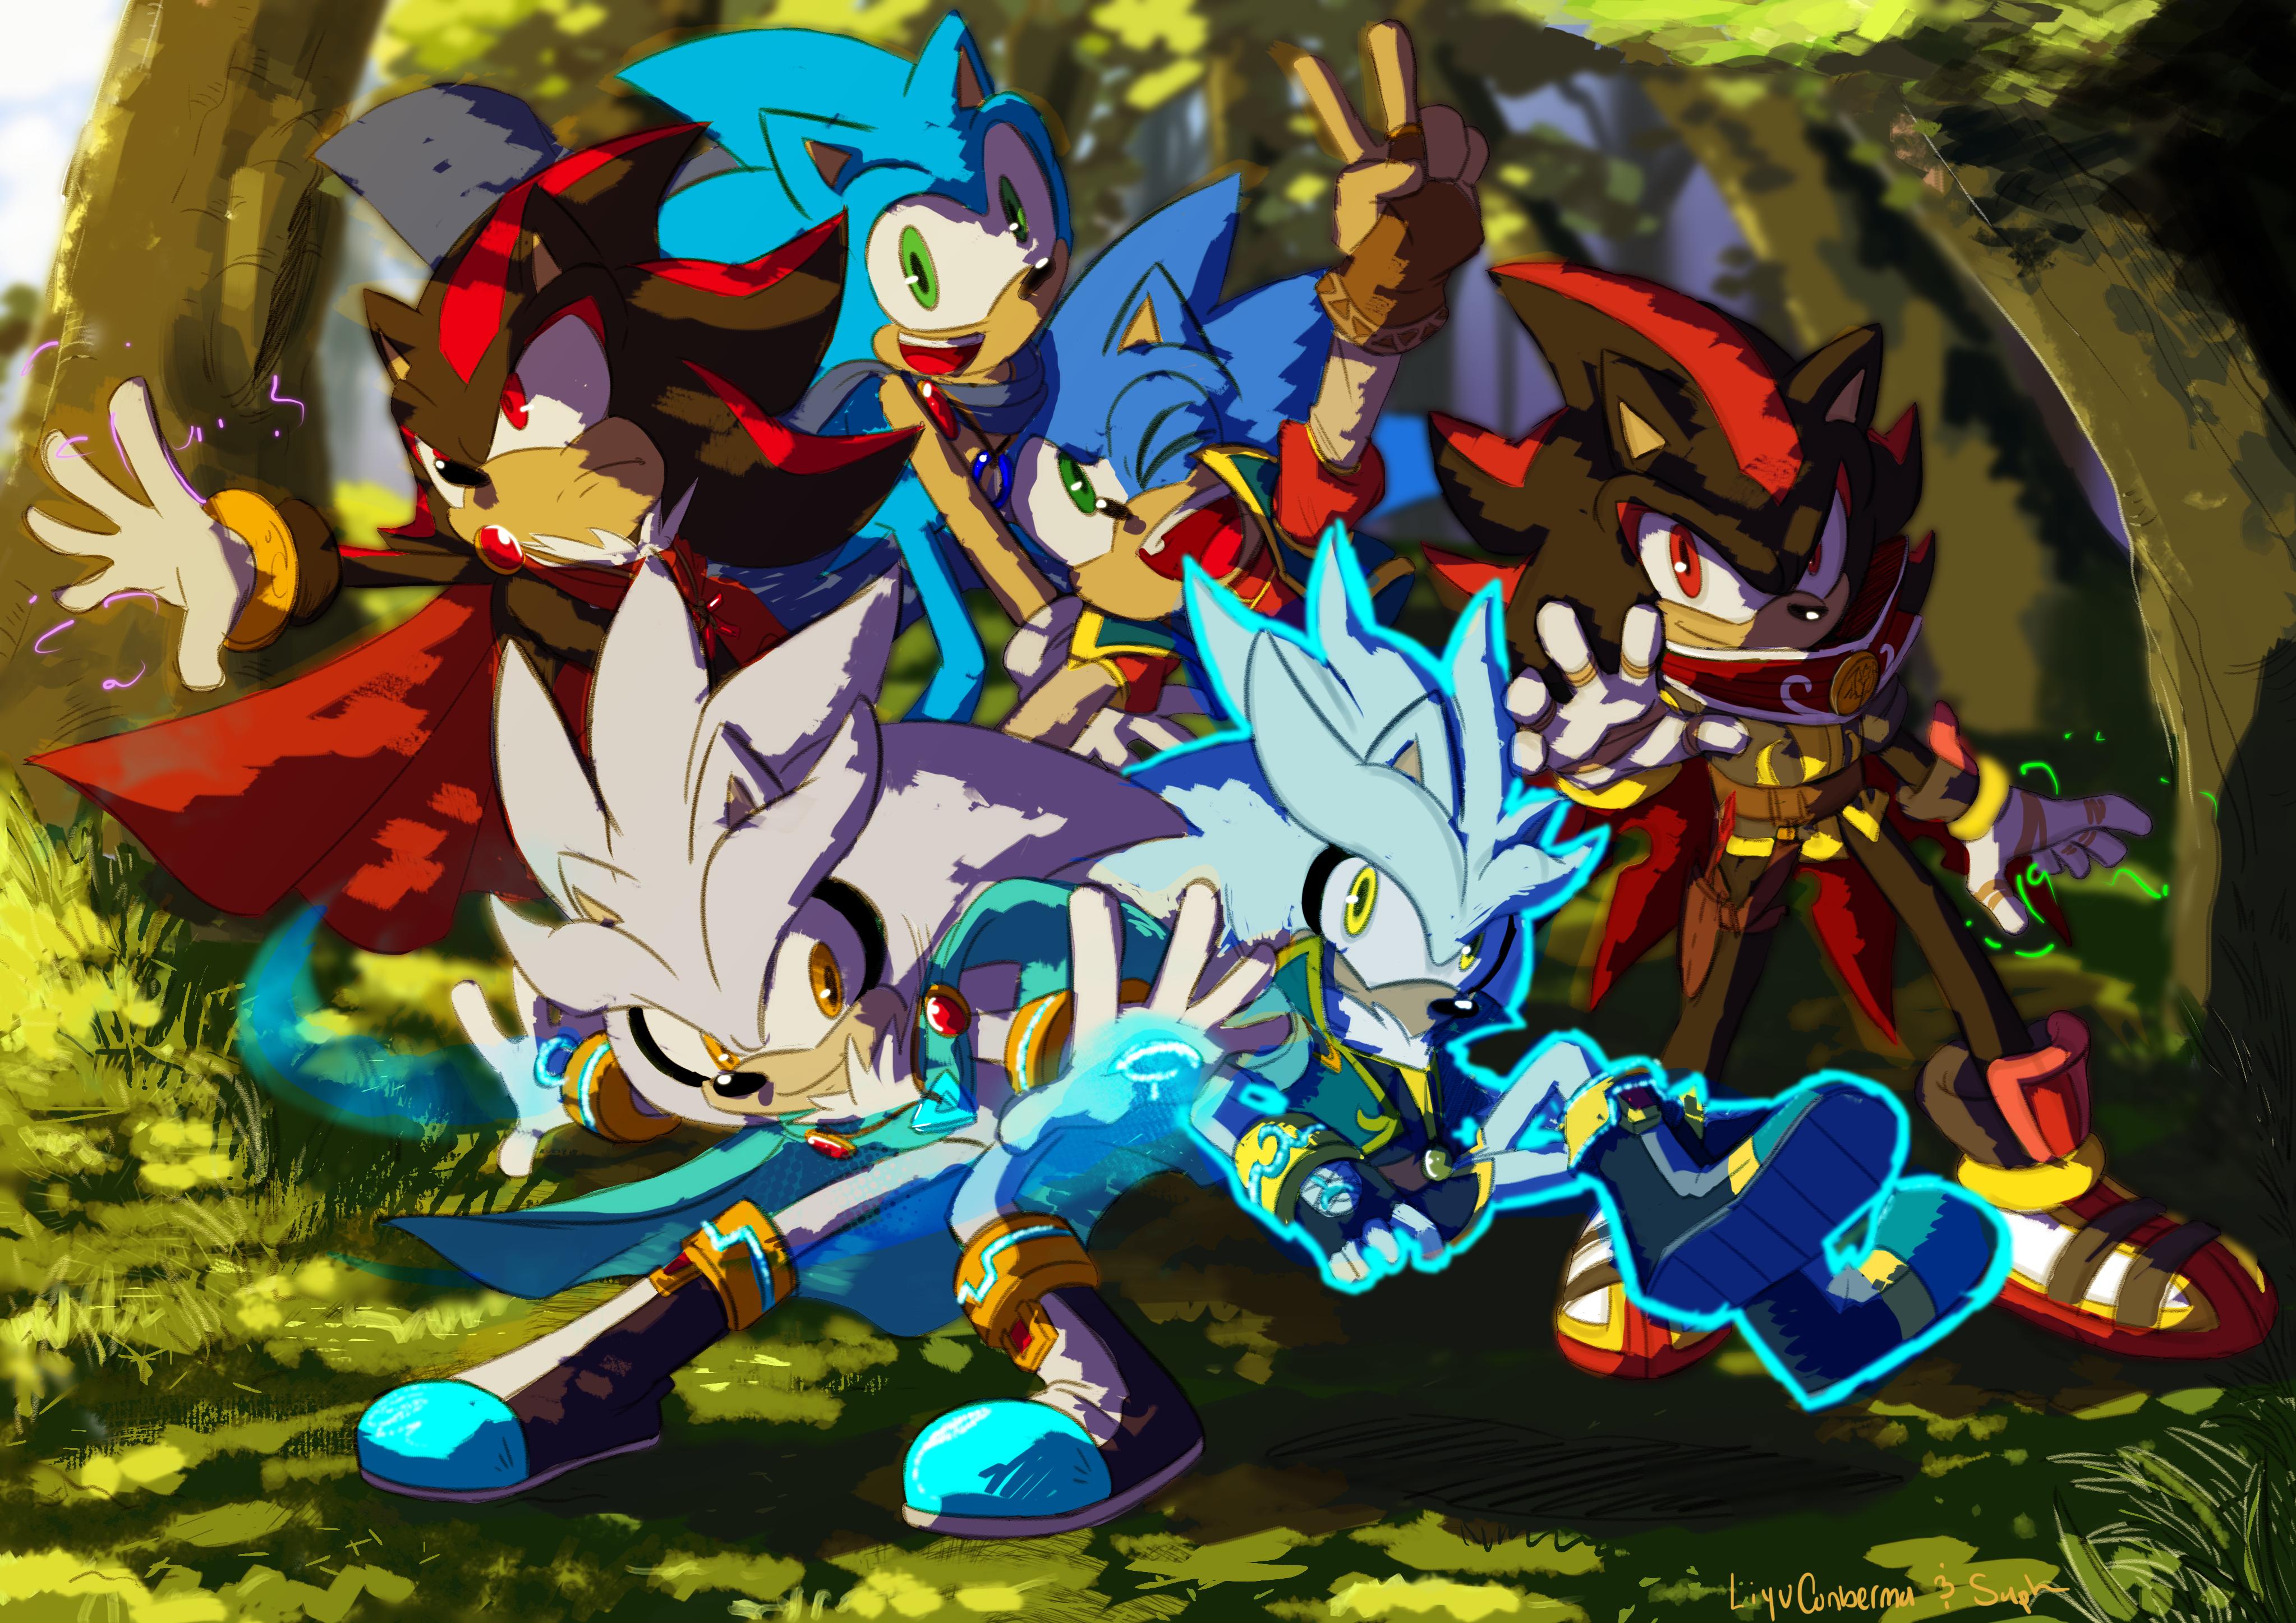 Wallpaper Illustration Anime Sonic The Hedgehog